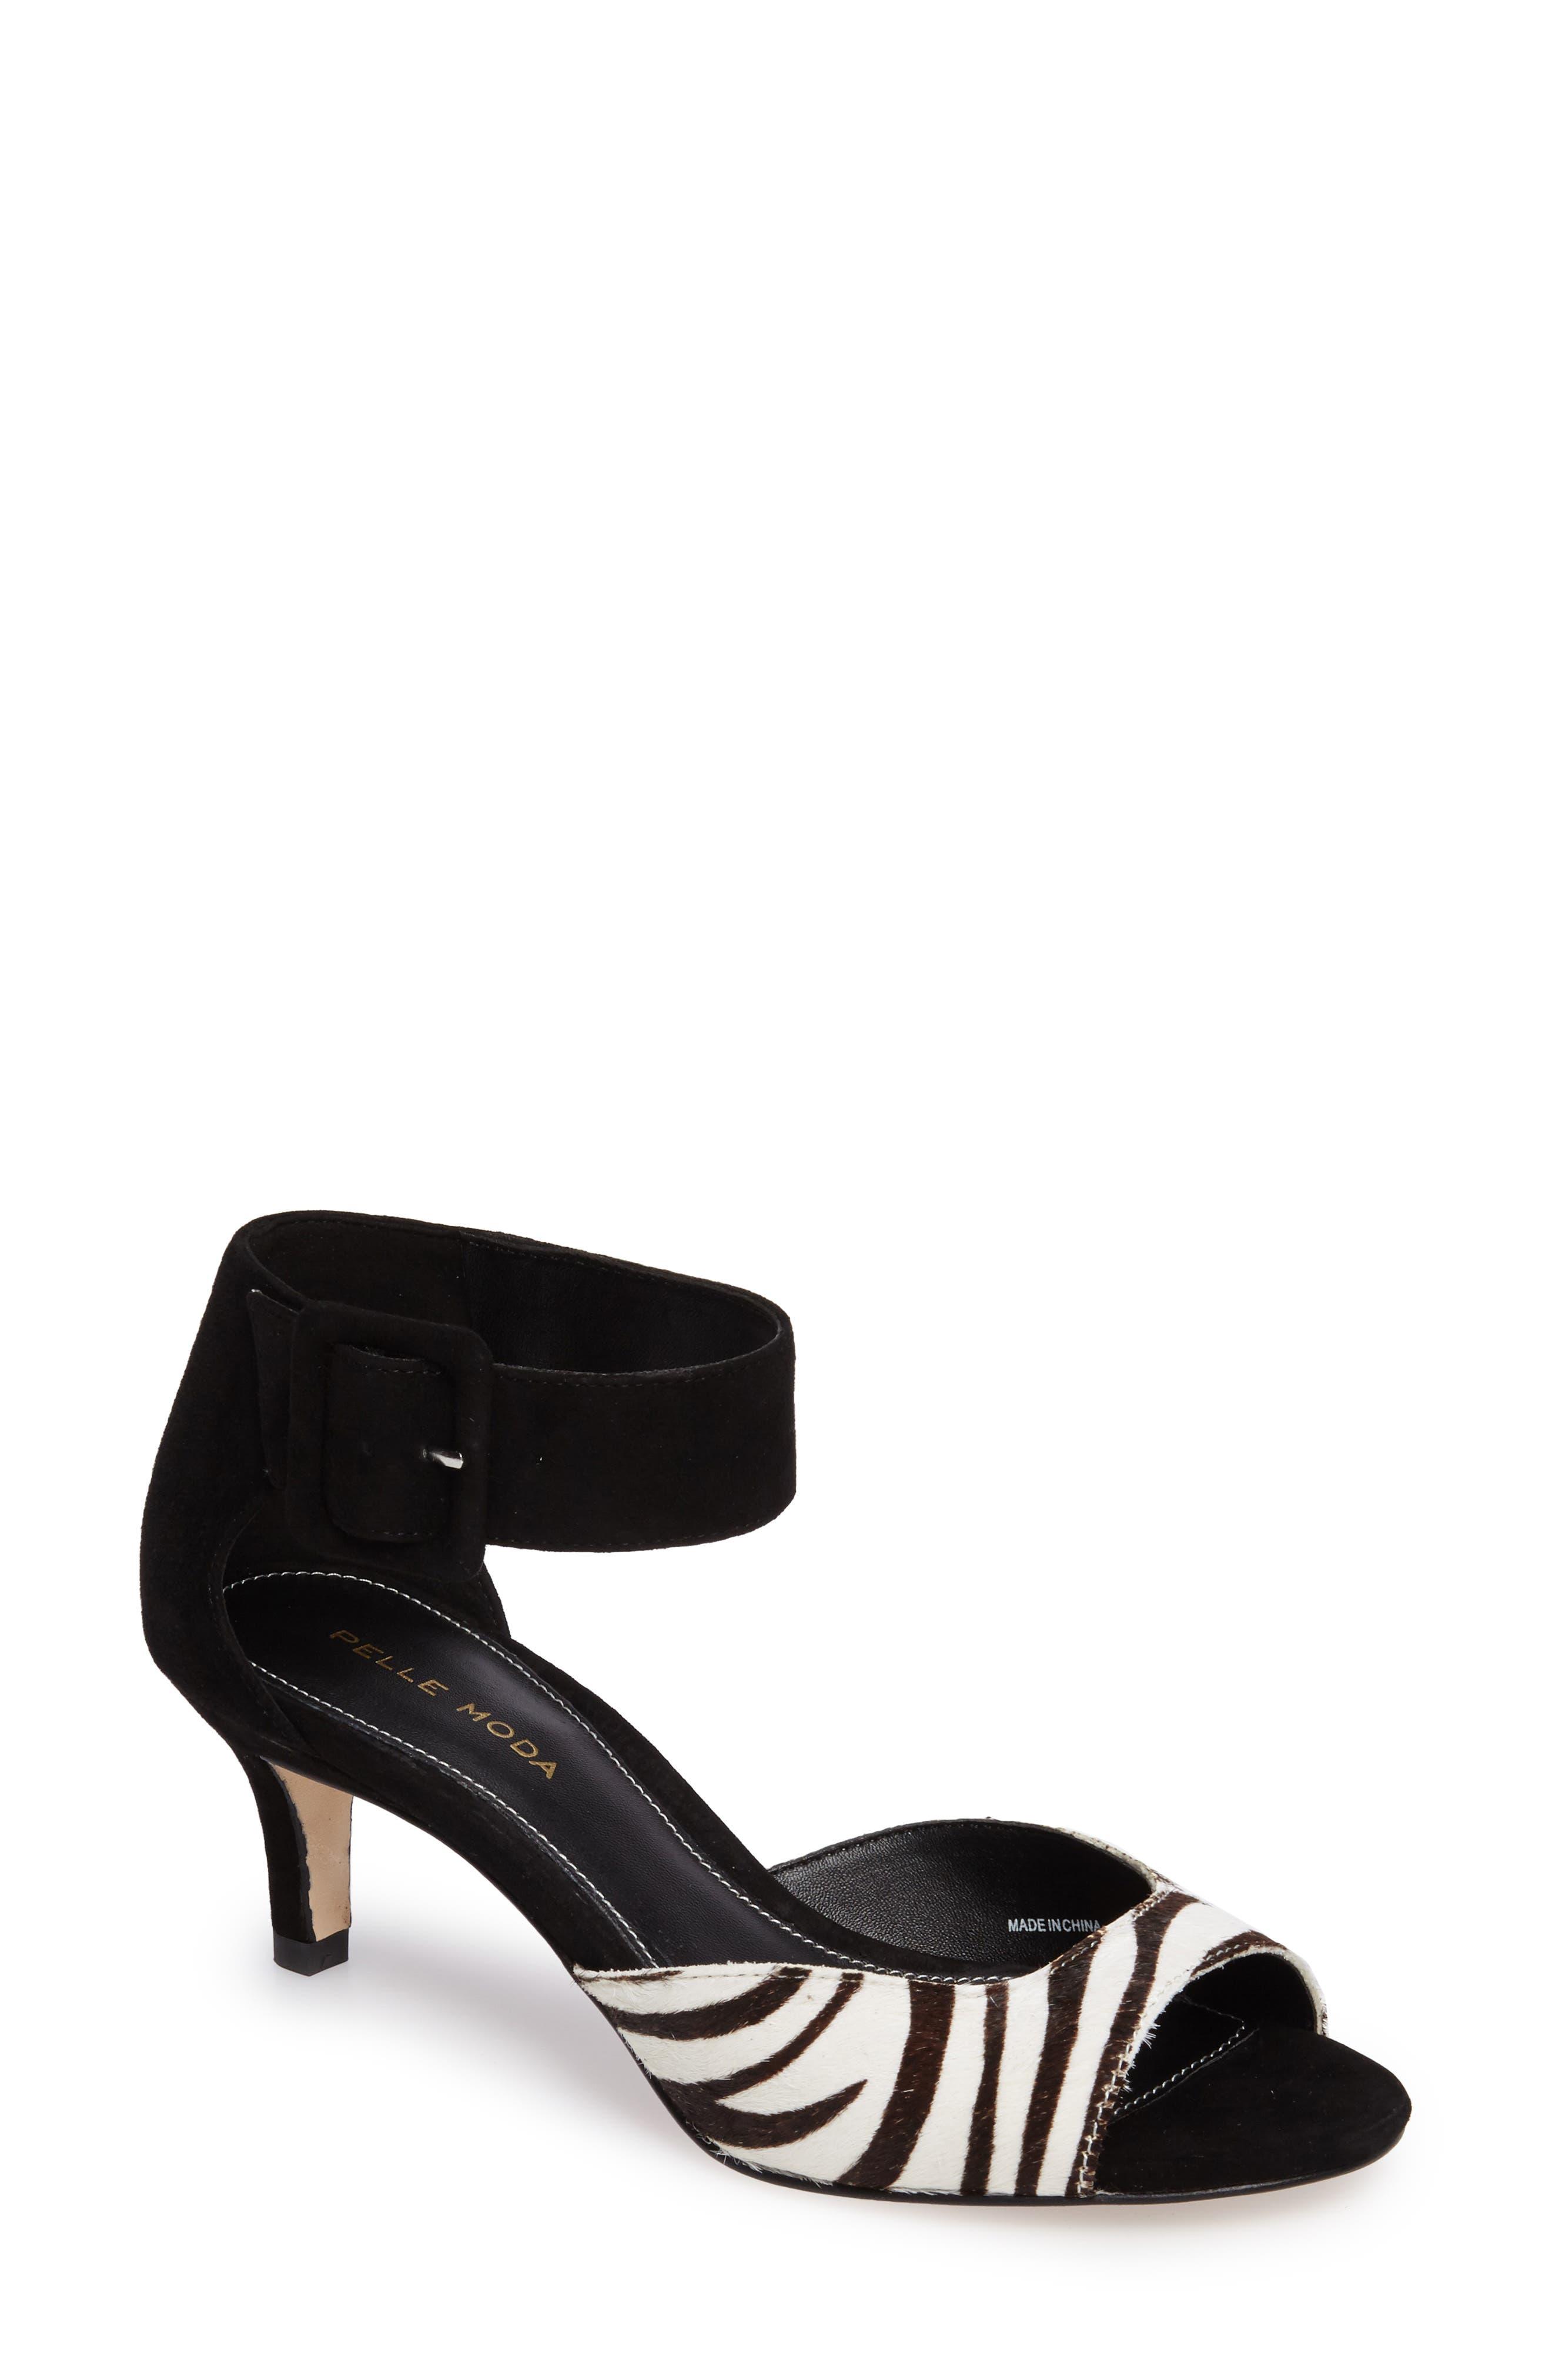 Pelle Moda 'Berlin' Genuine Calf Hair Sandal